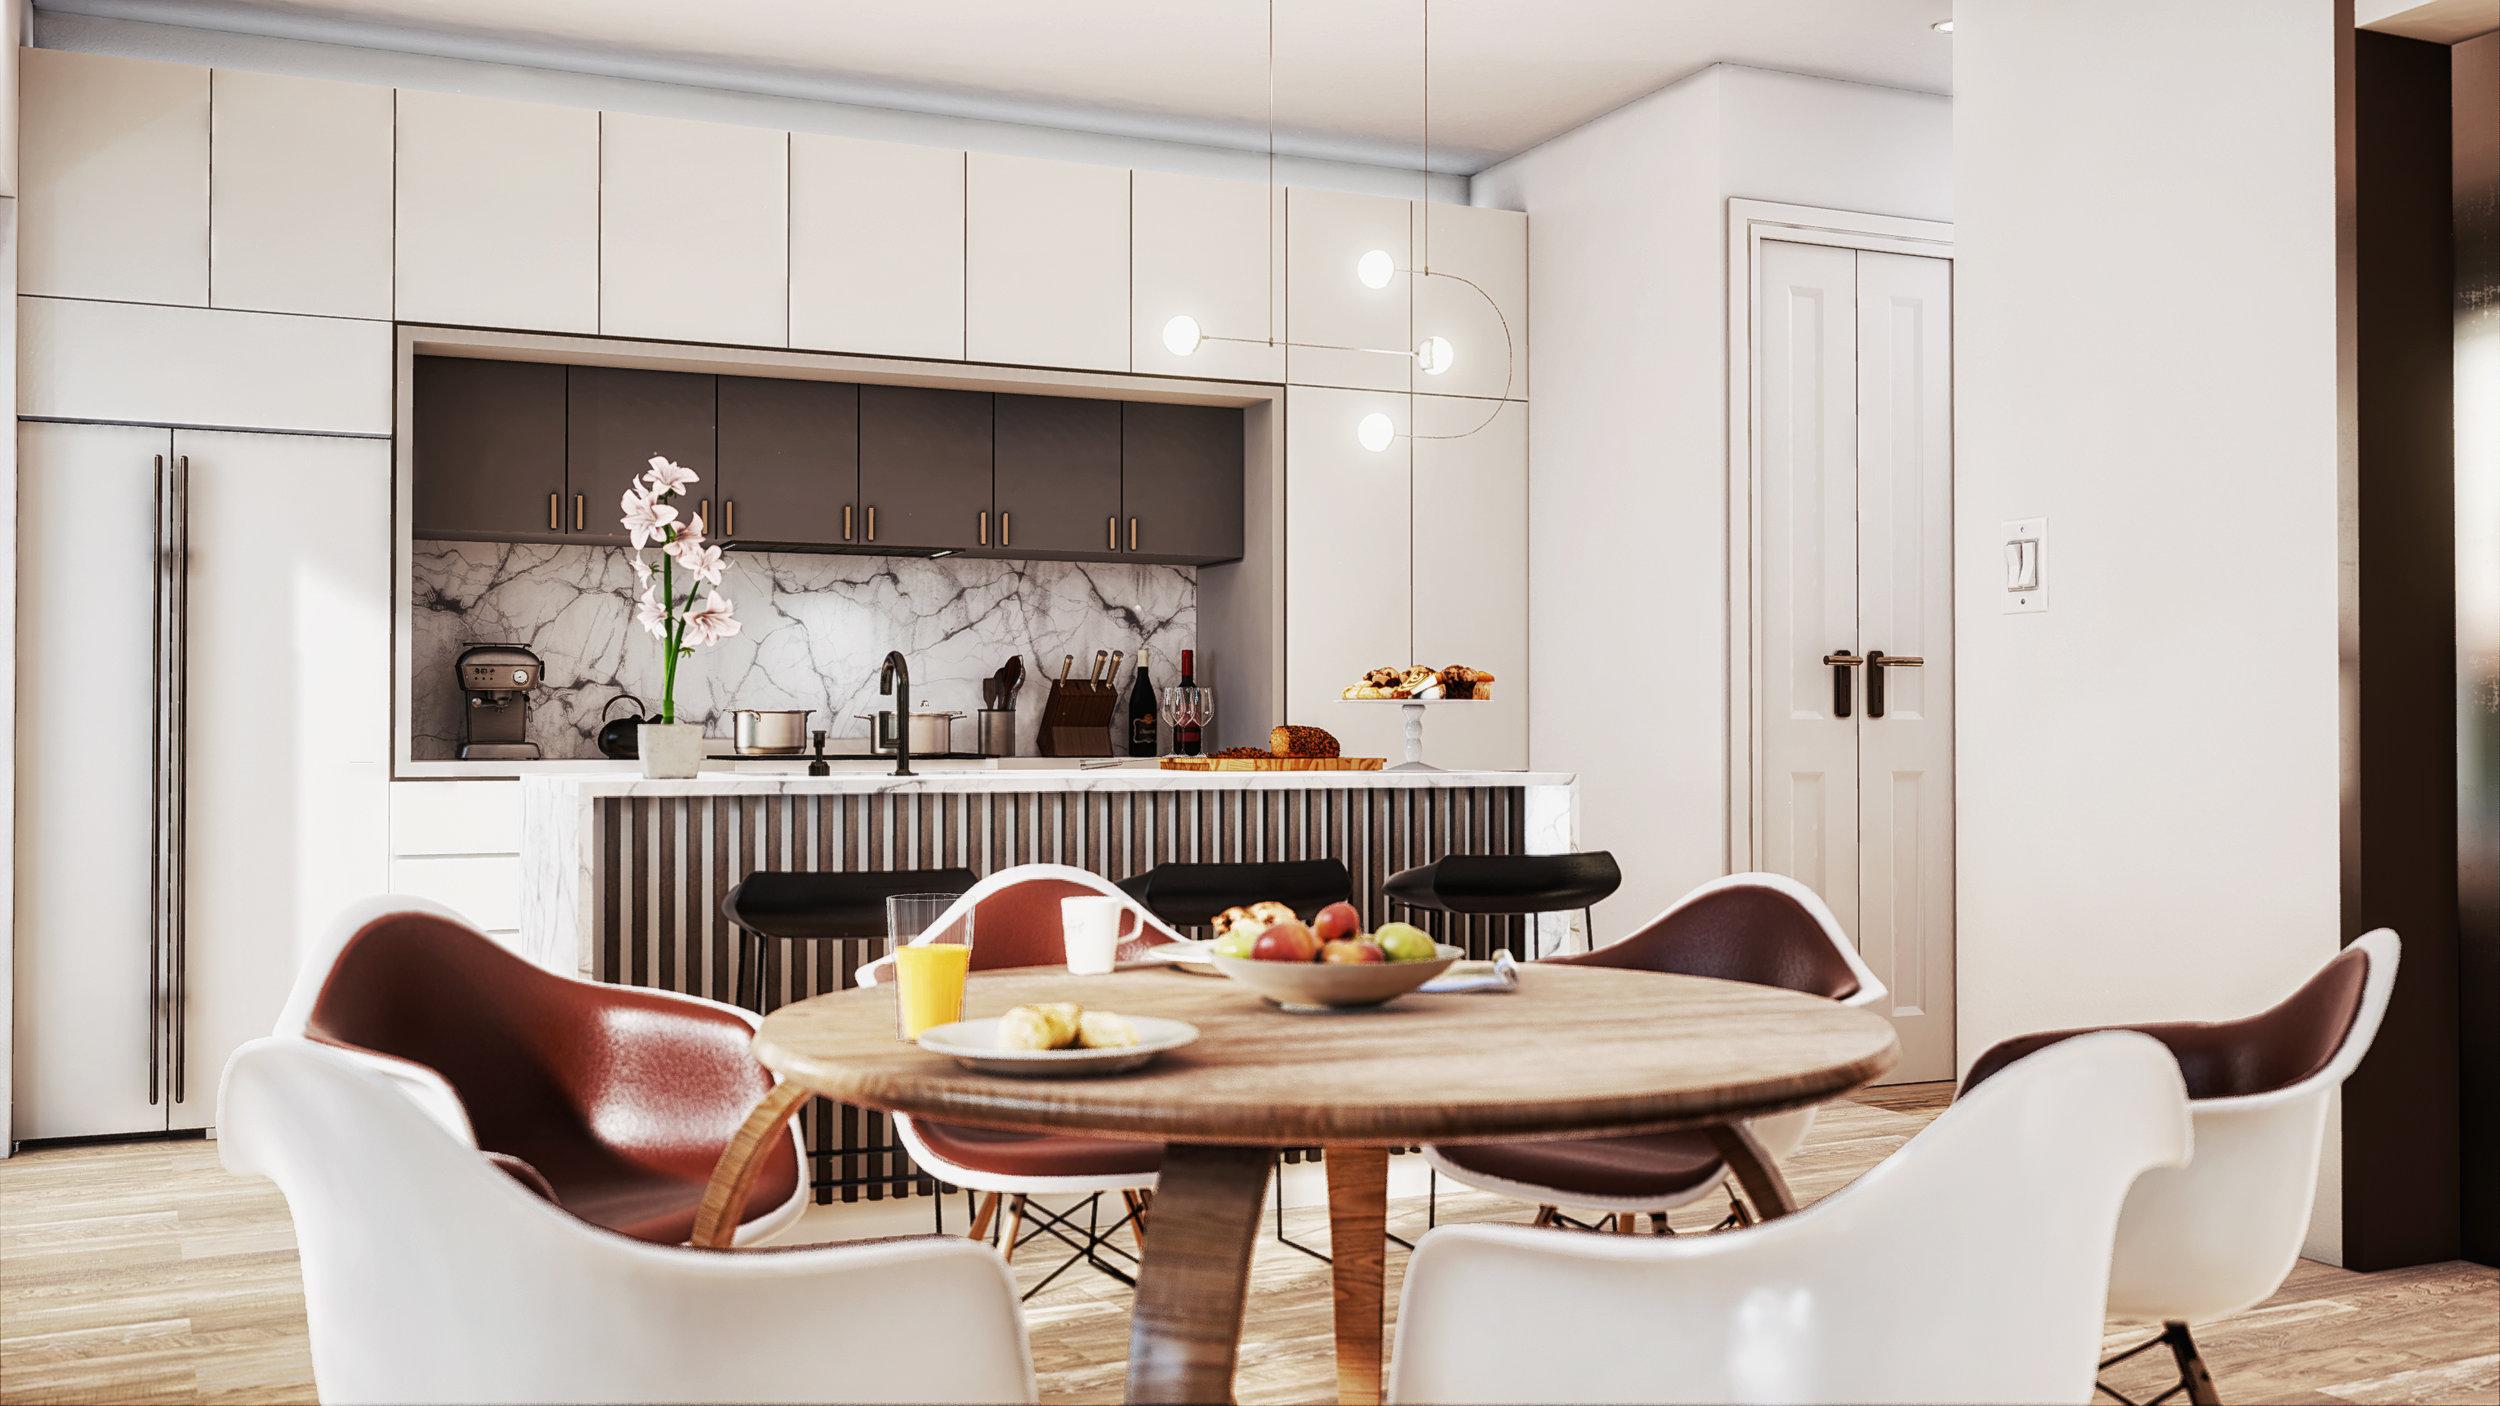 LivingRoom_Table-facing-Kitchen.jpg